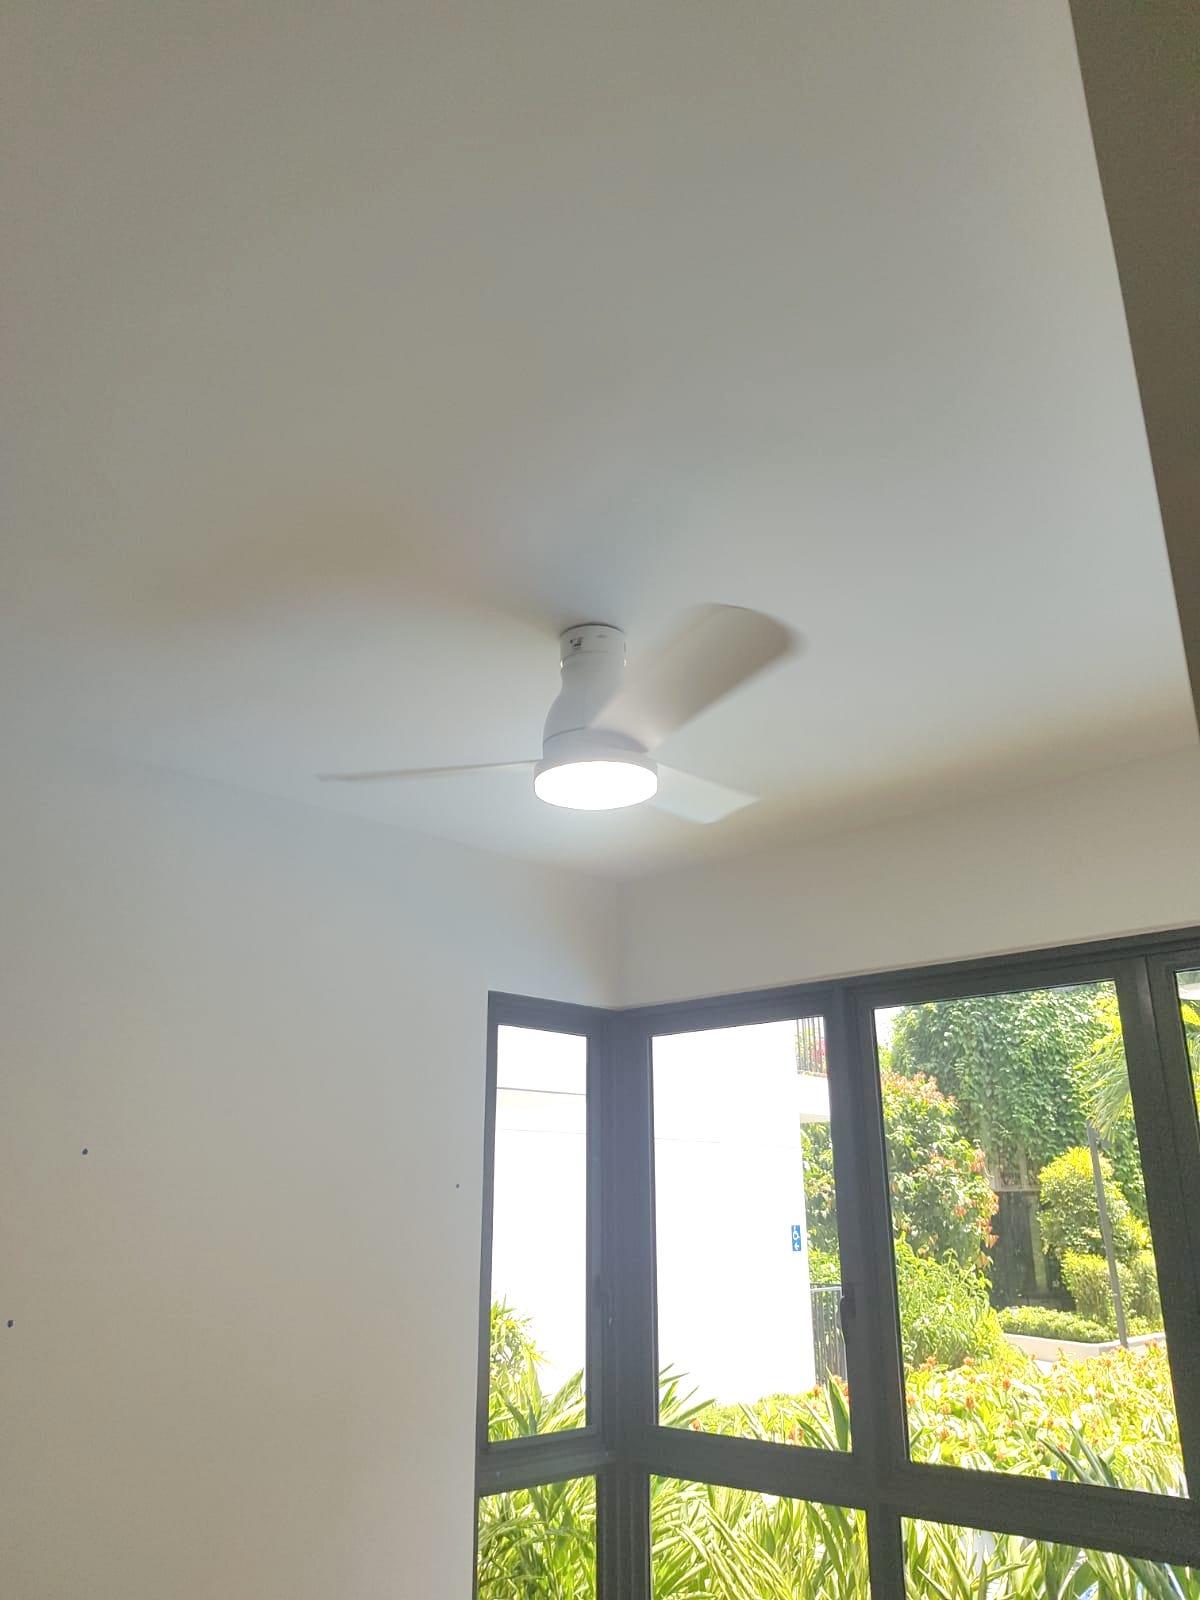 2020 Buyer S Guide For Ceiling Fans In Singapore Sembawang Lighting House Pte Ltd